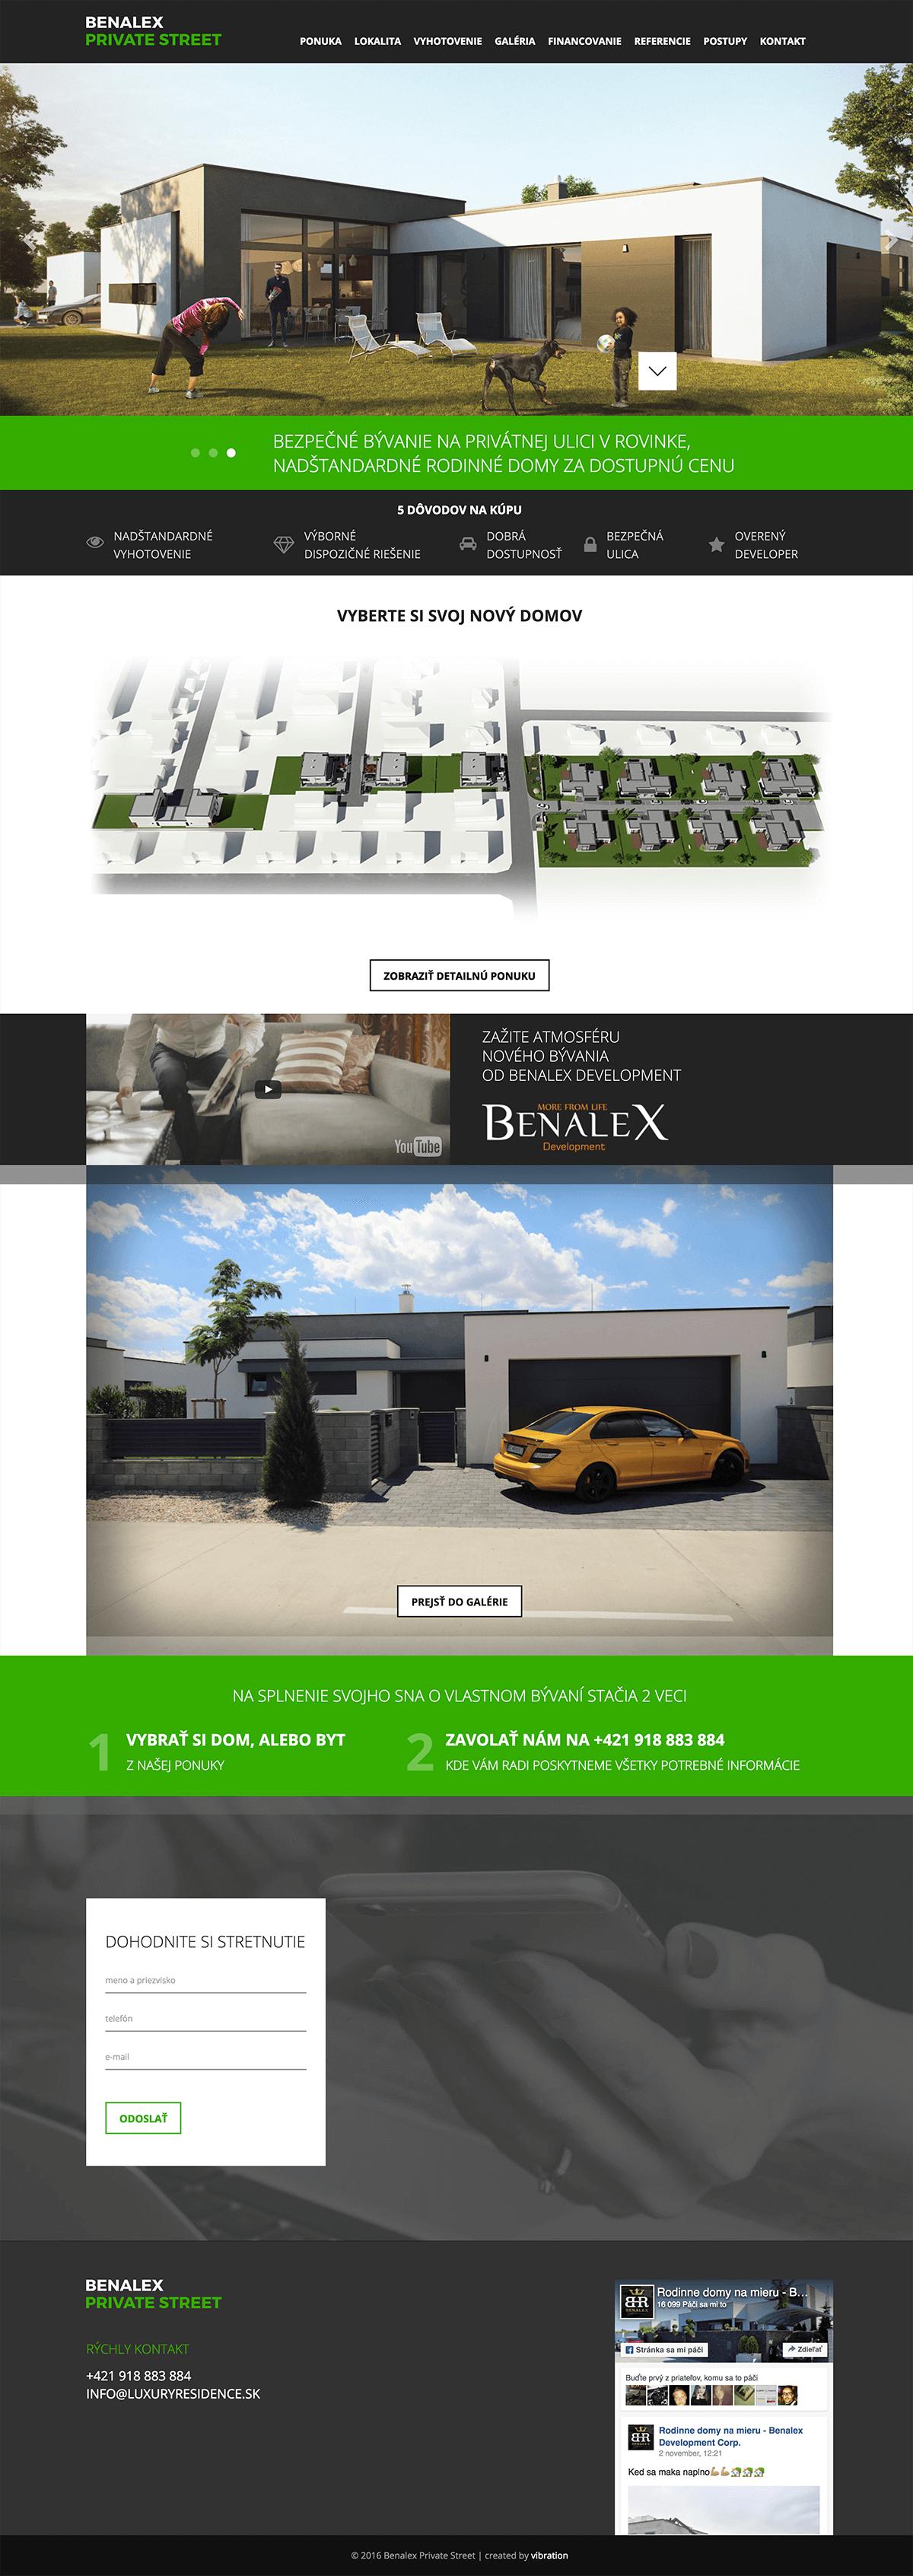 benalexprivatestreet-sk